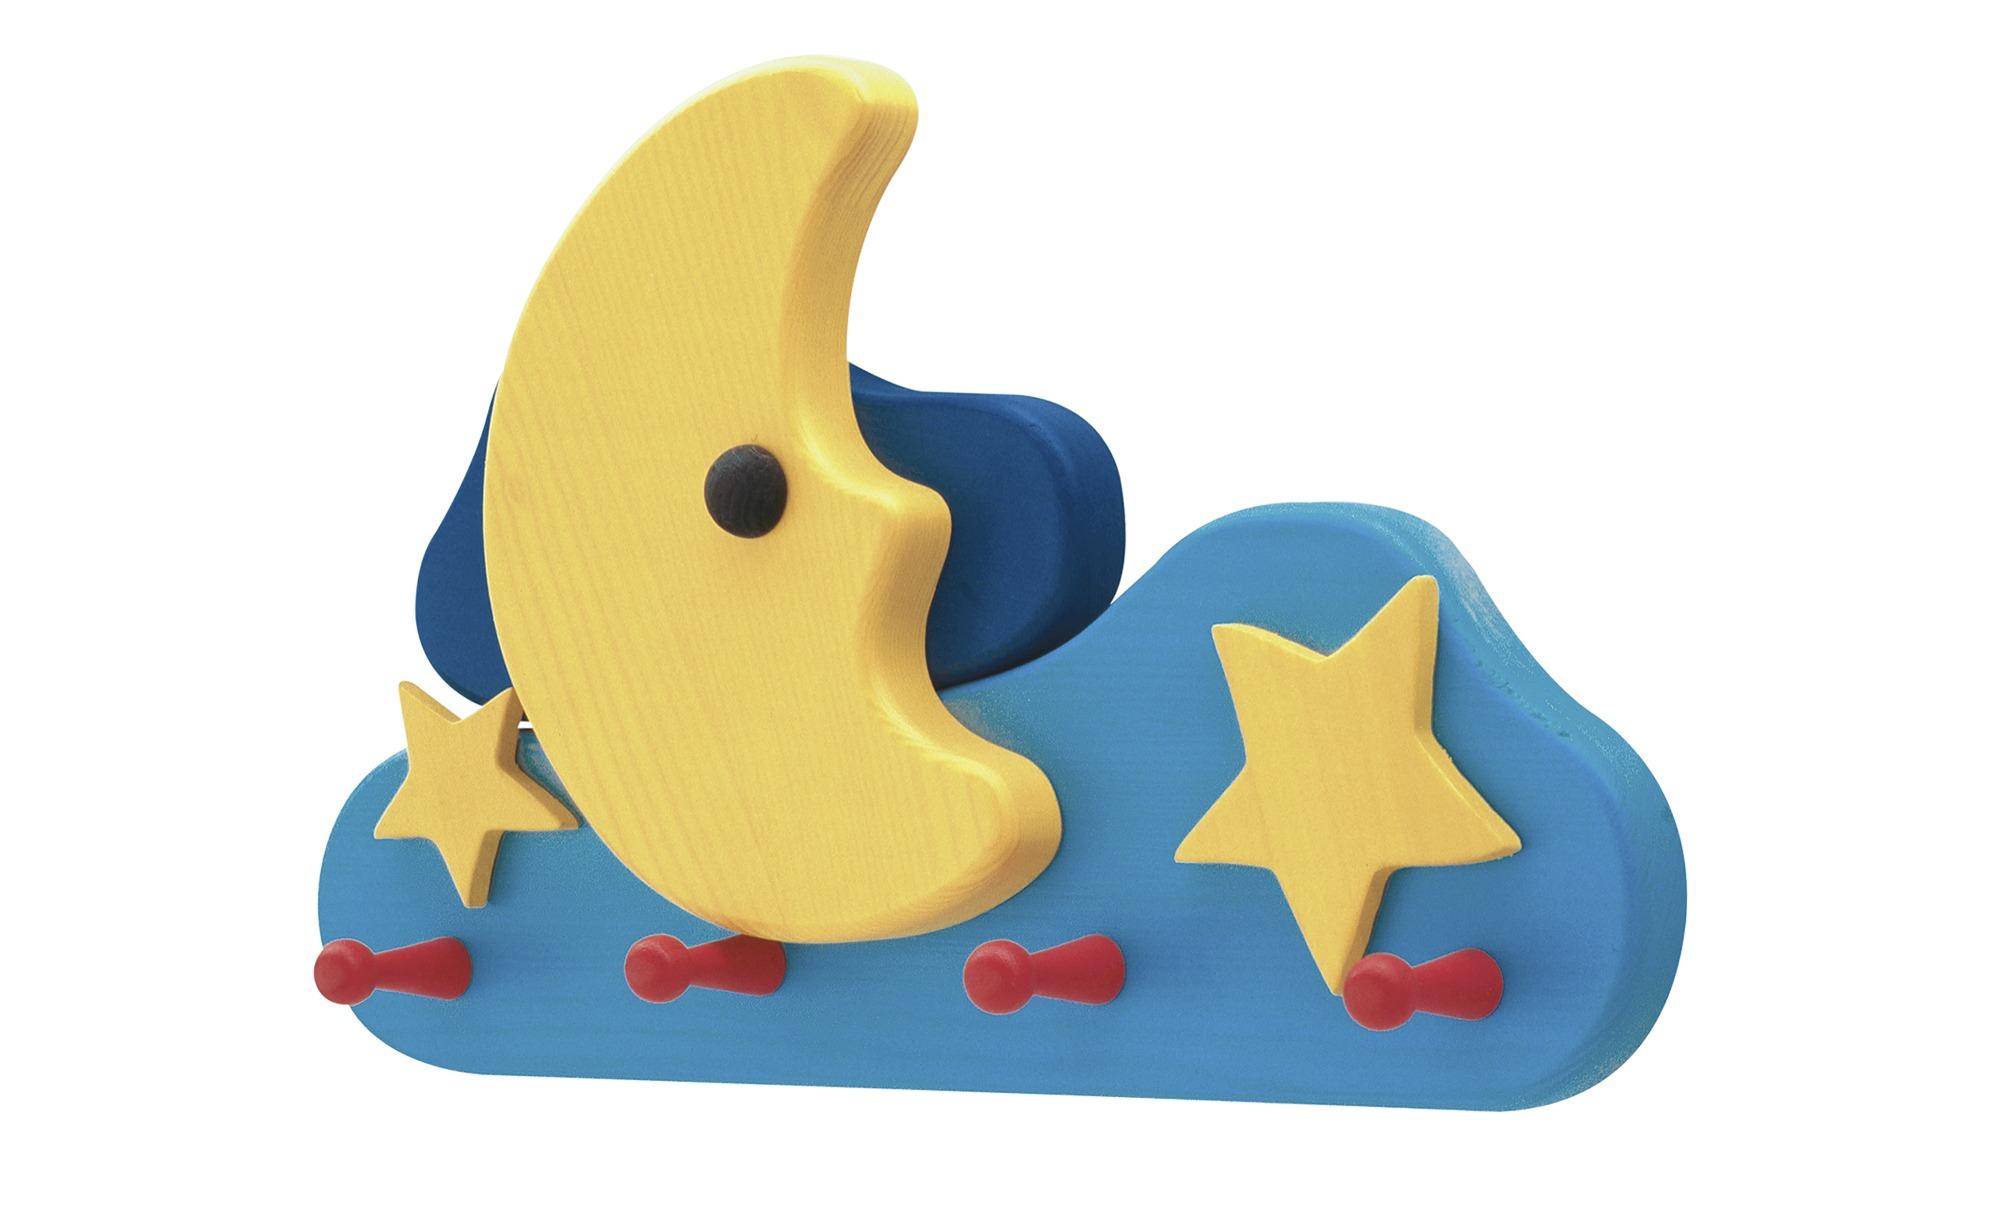 Kindergarderobe - mehrfarbig - 35 cm - 22 cm - 7 cm - Sconto